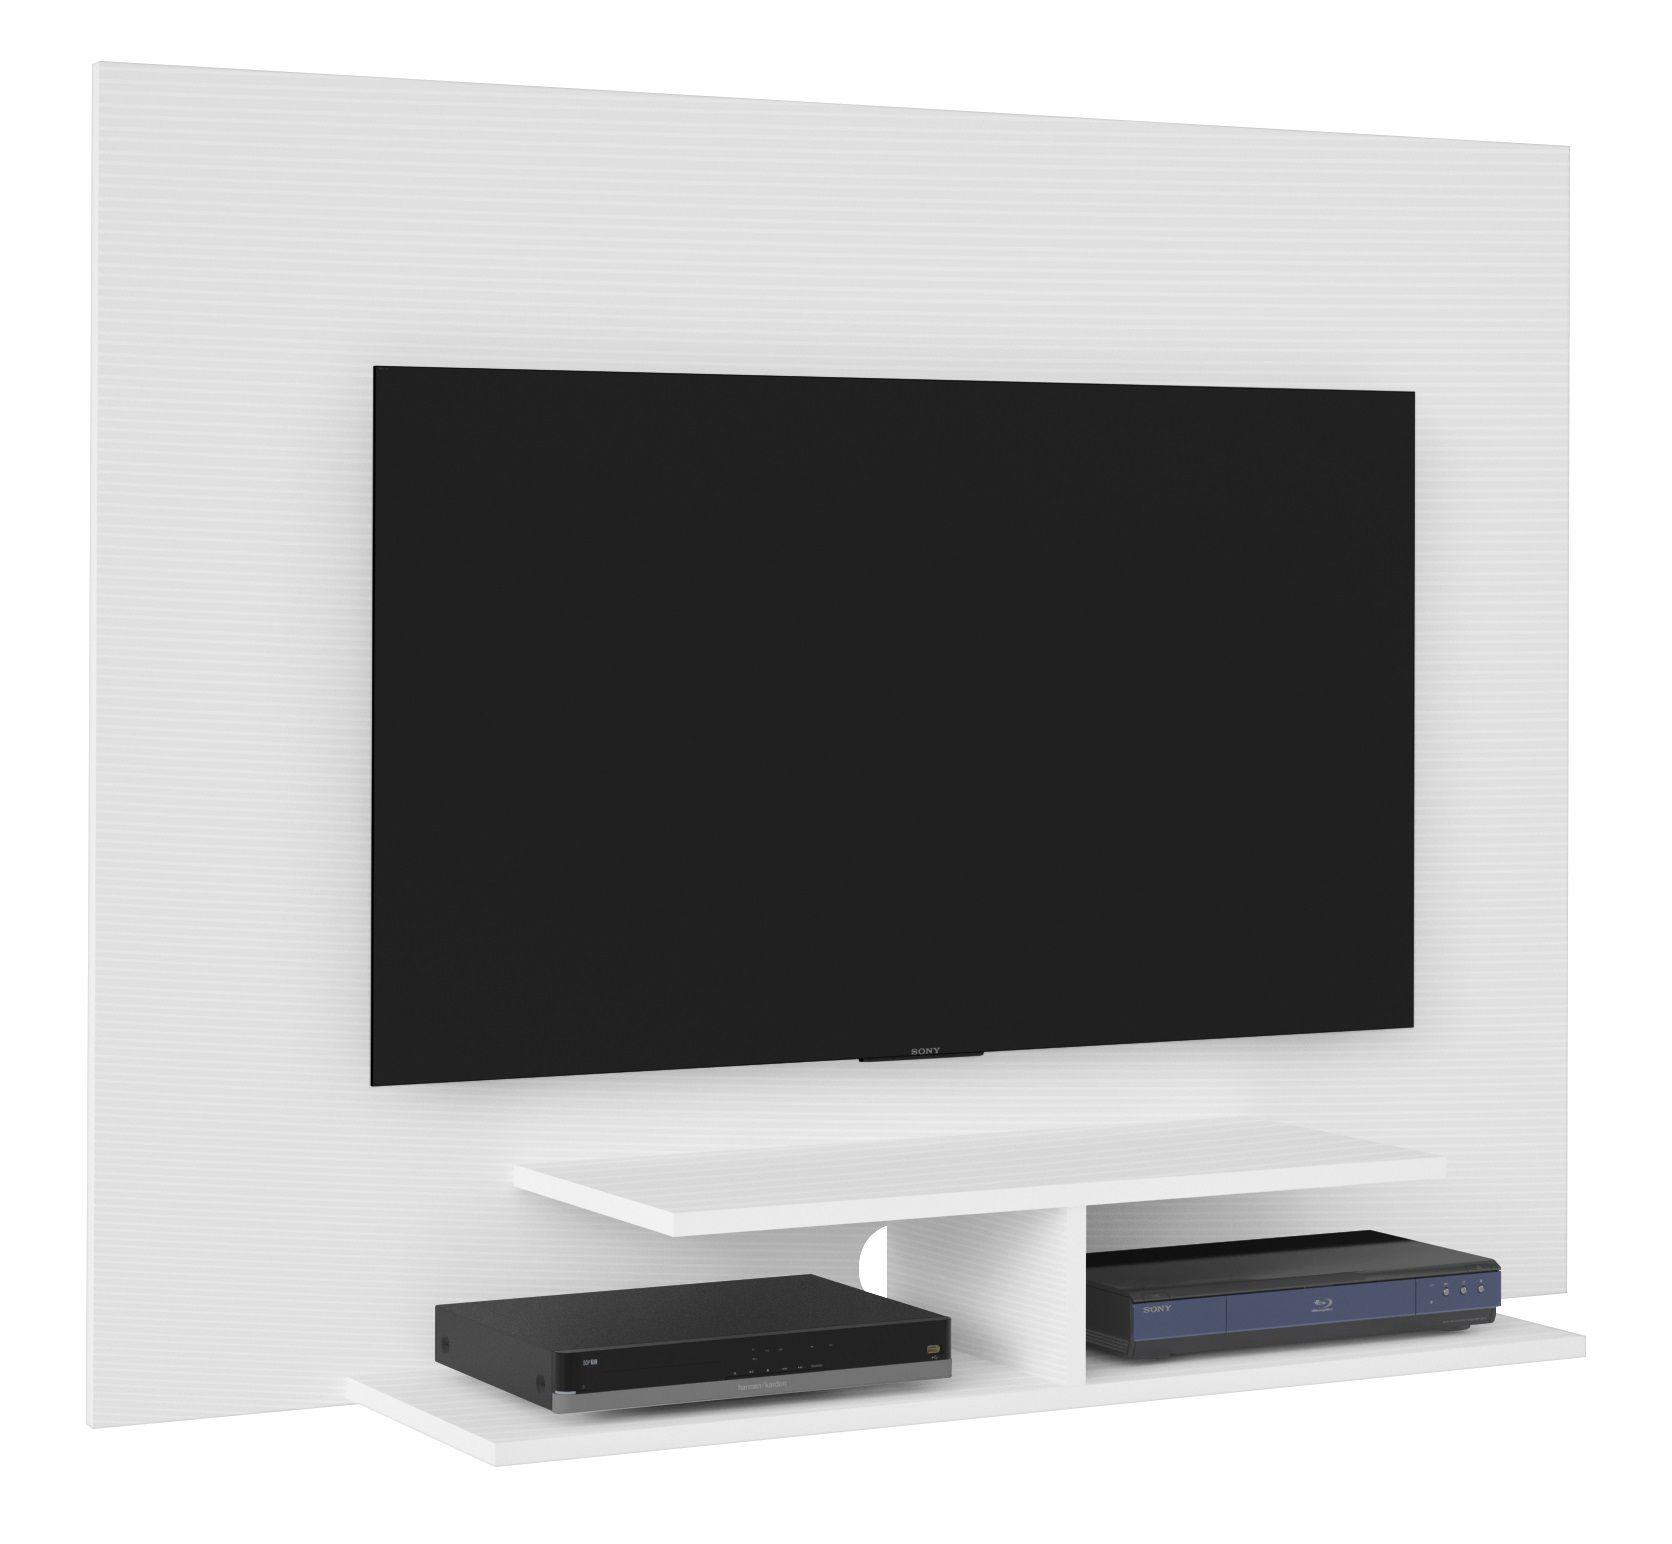 Painel Jet Plus  para TV até 42 polegadas 2 Prateleiras - Artely